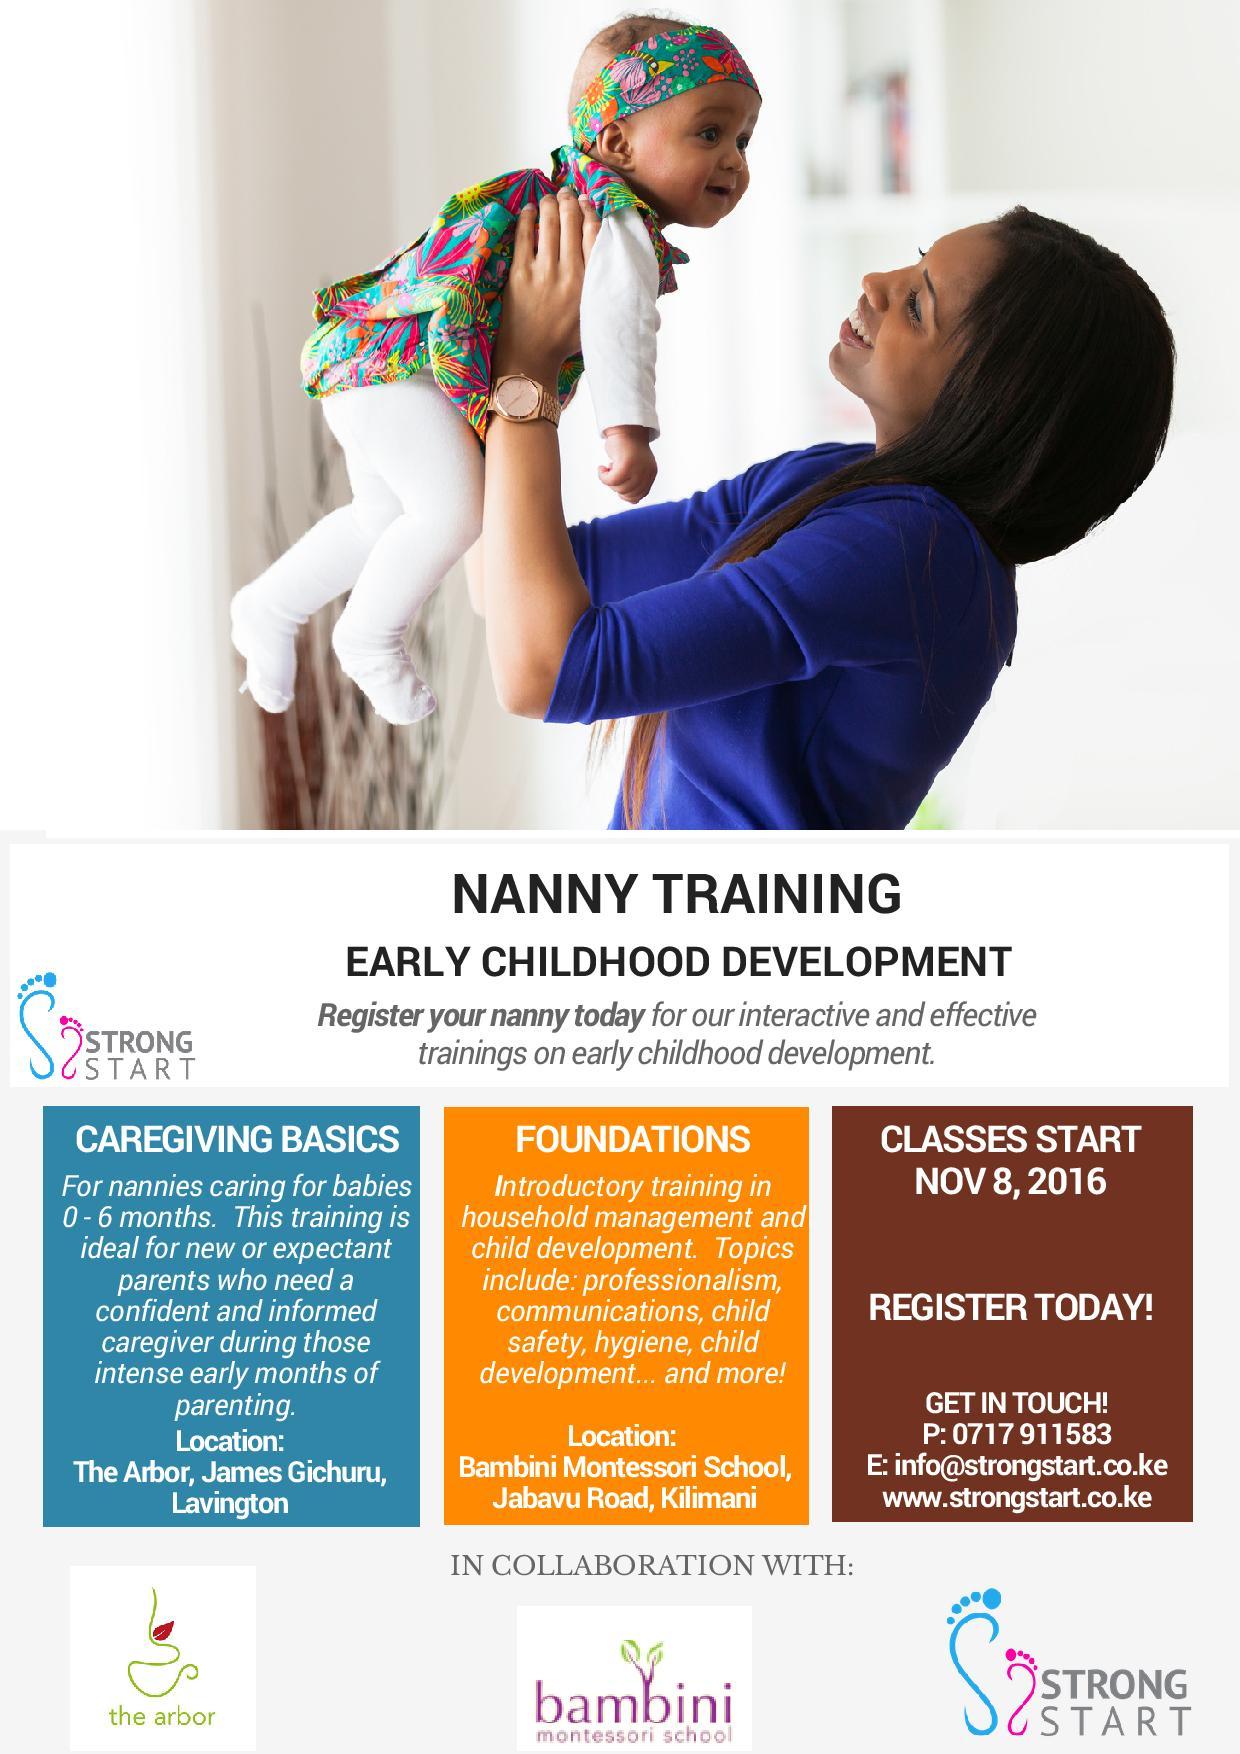 Strong Start: Child Development Training